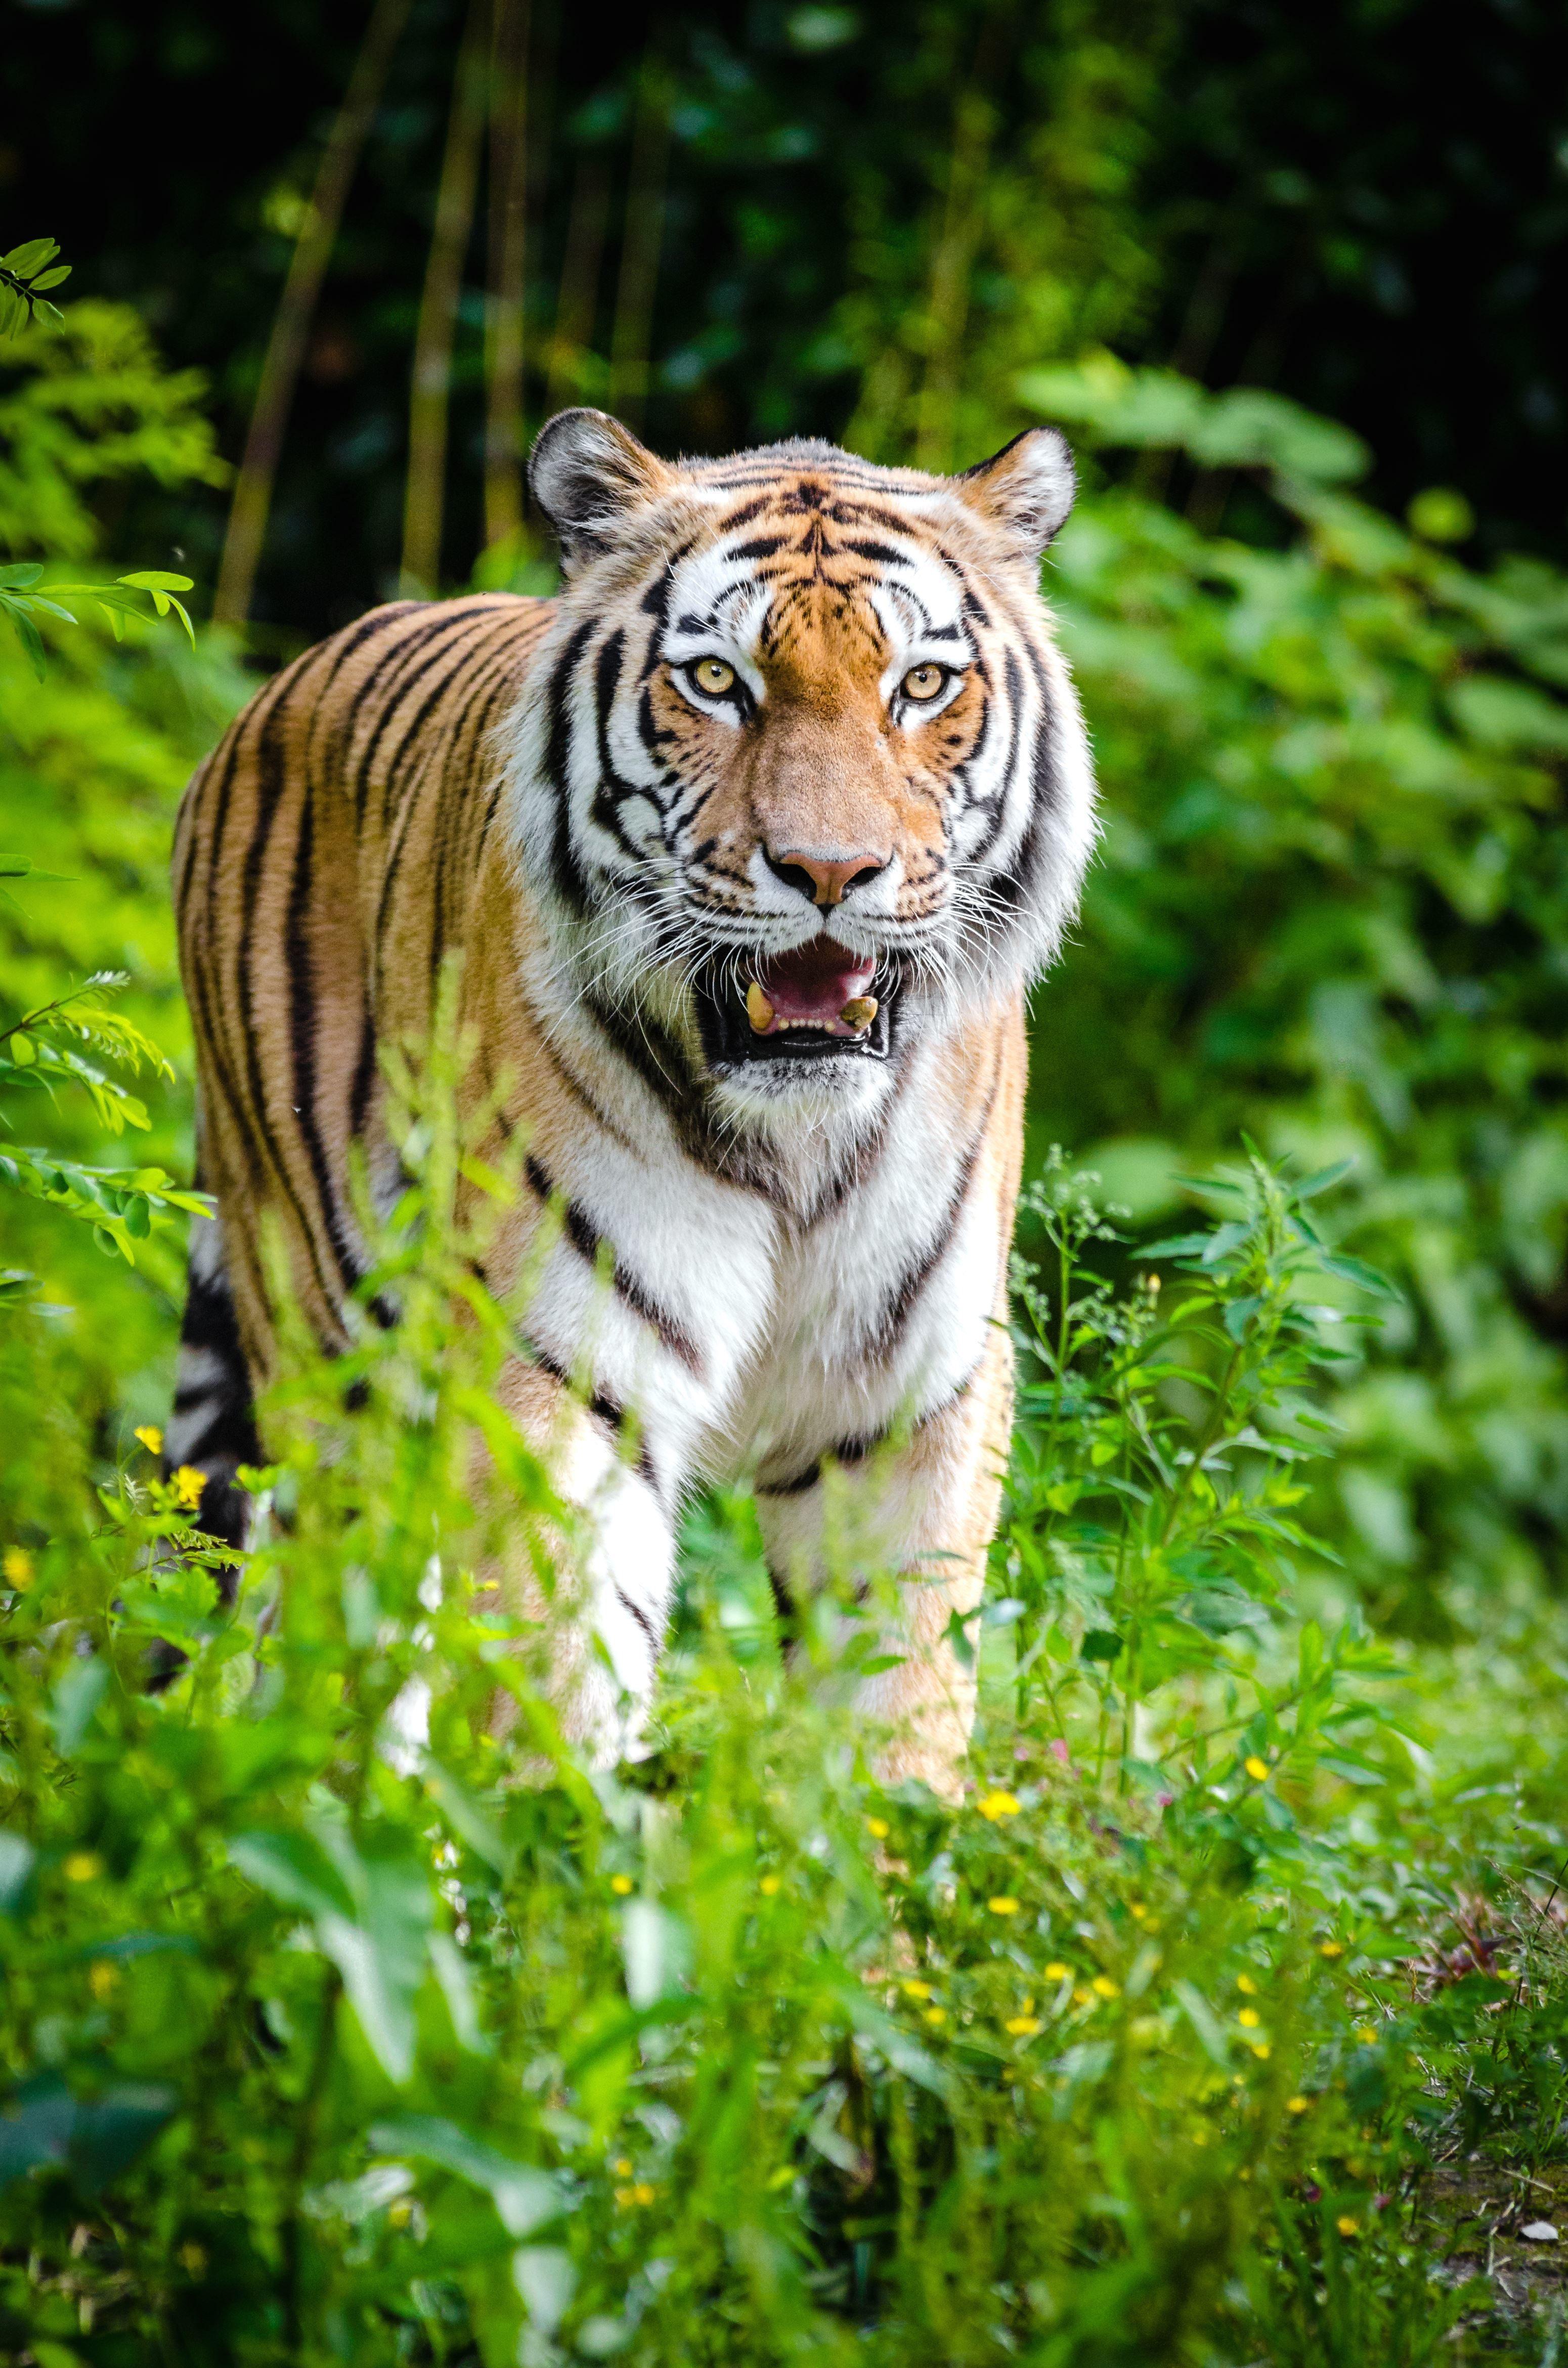 Jungle Animal Wallpaper Free Picture Animal Tiger Jungle Nature Plants